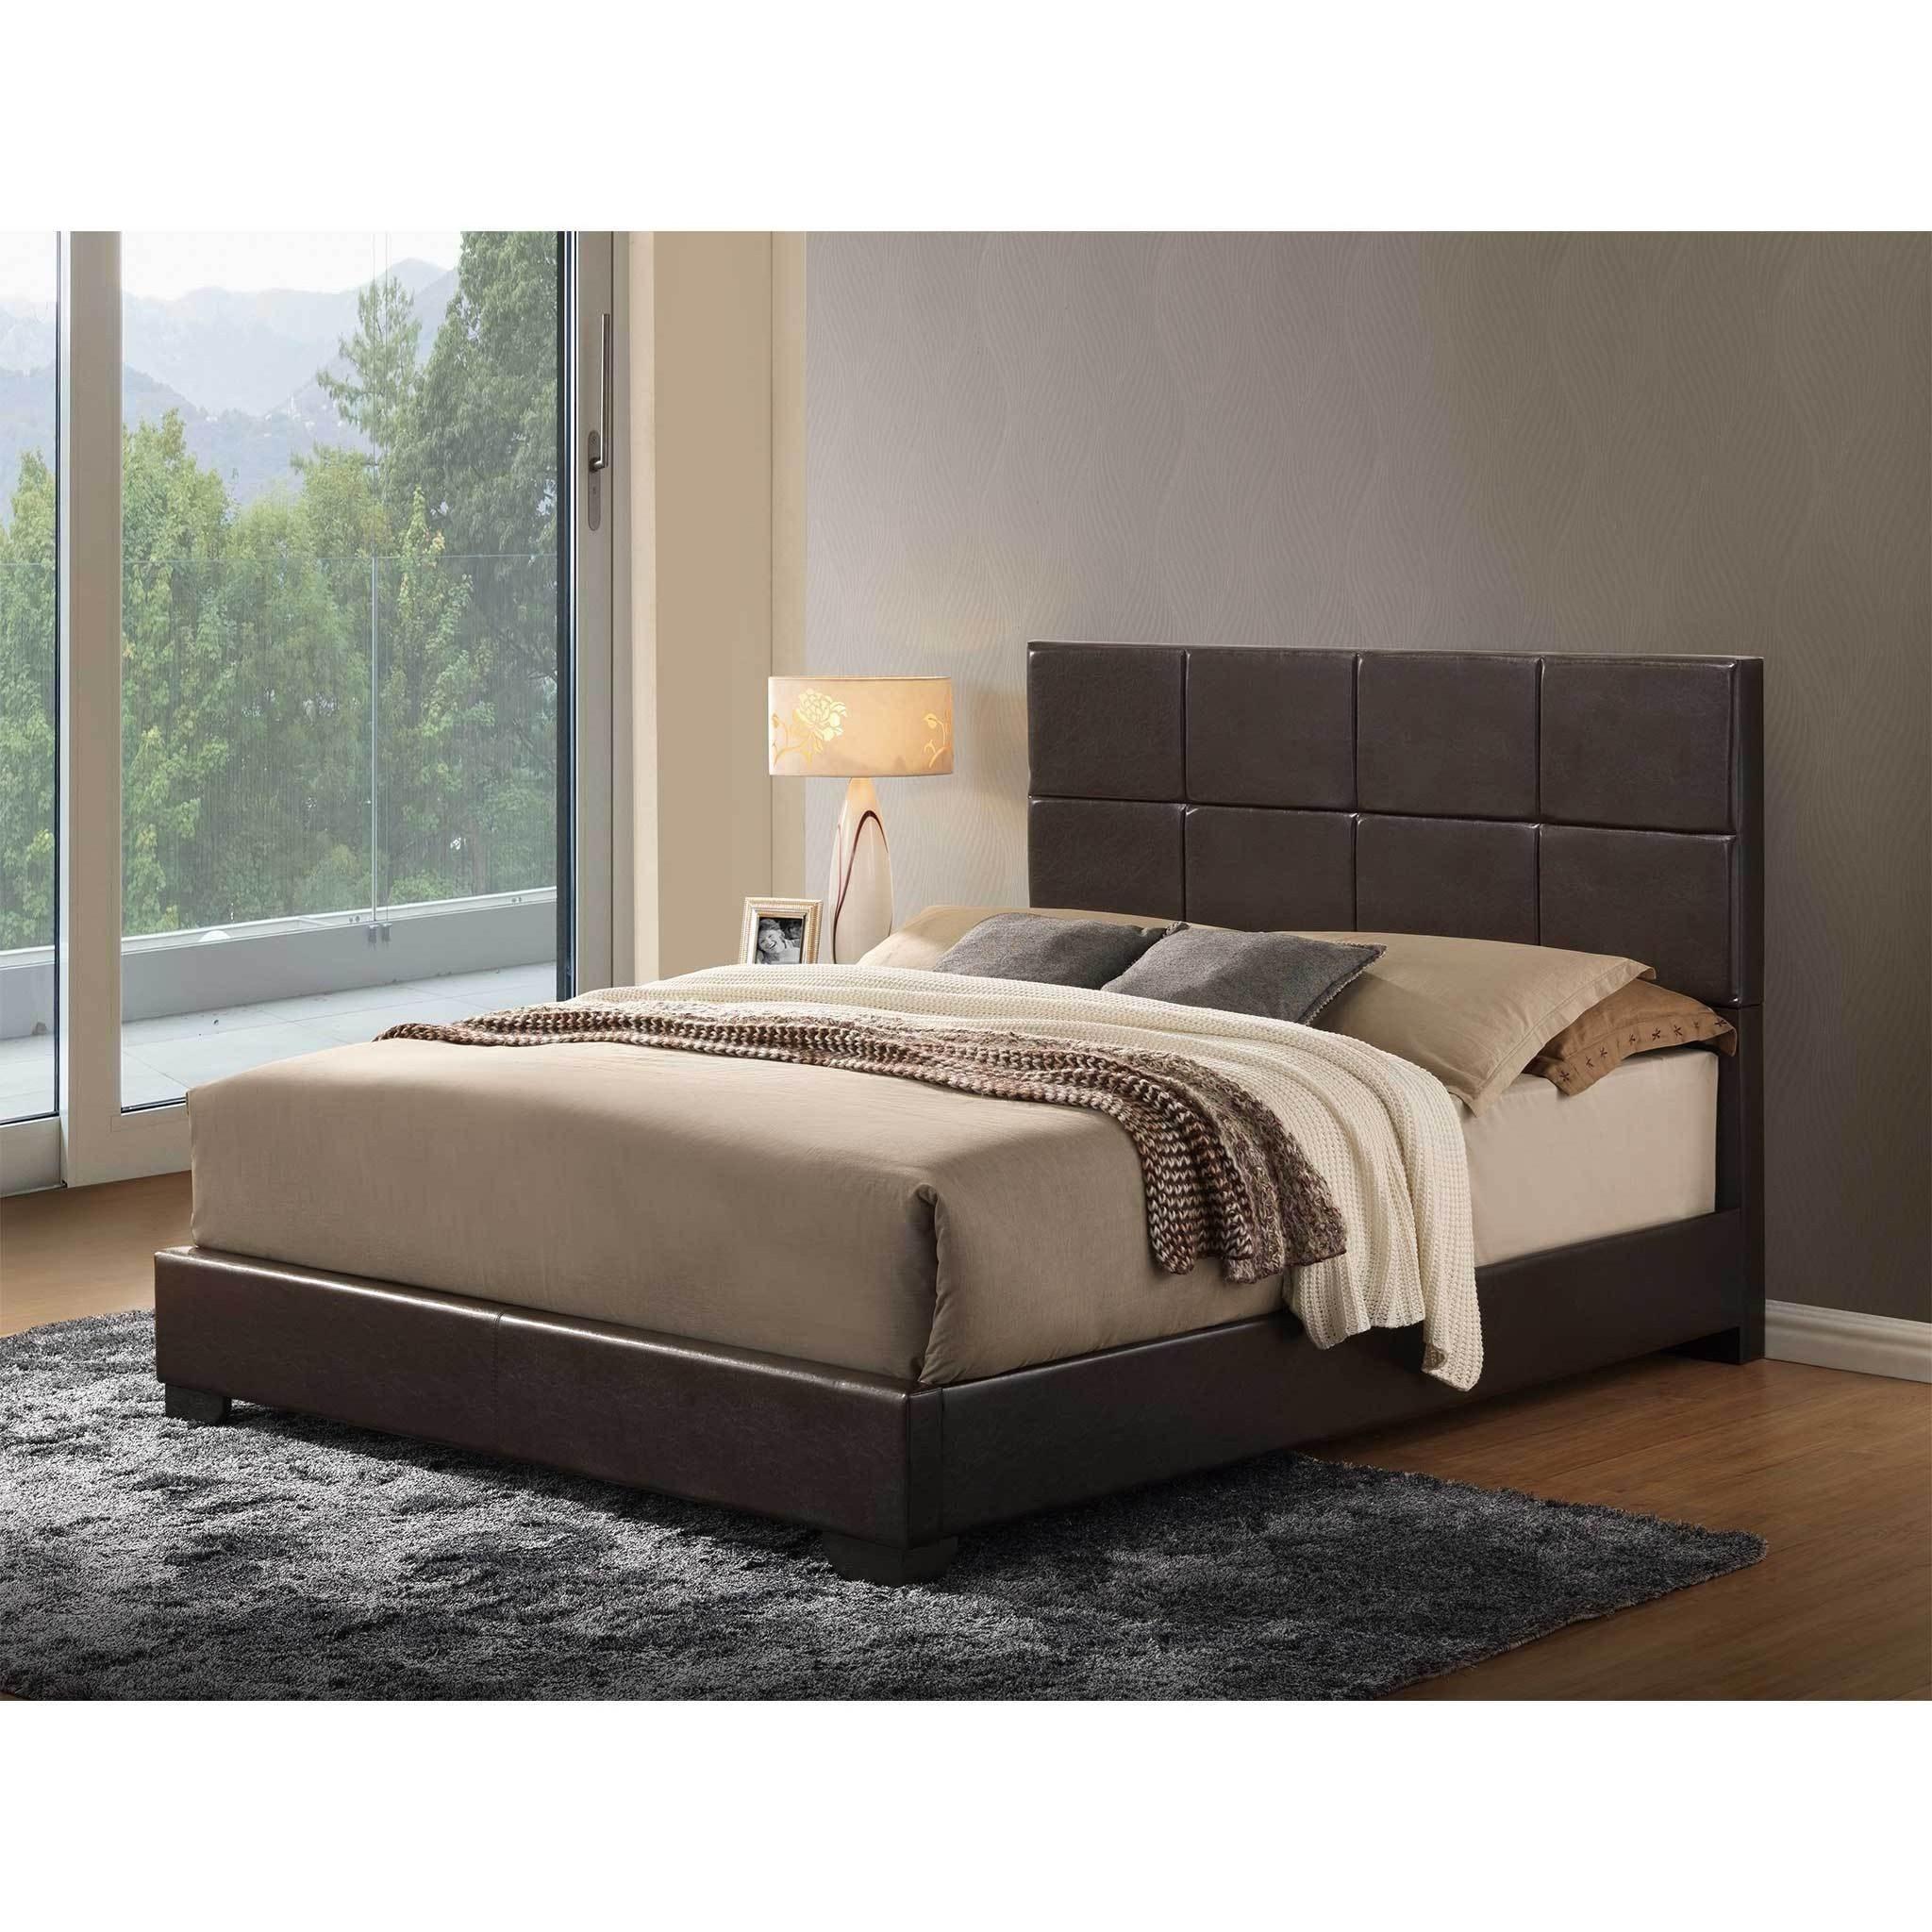 8566 Upholstered Full Bed by Global Furniture at Corner Furniture